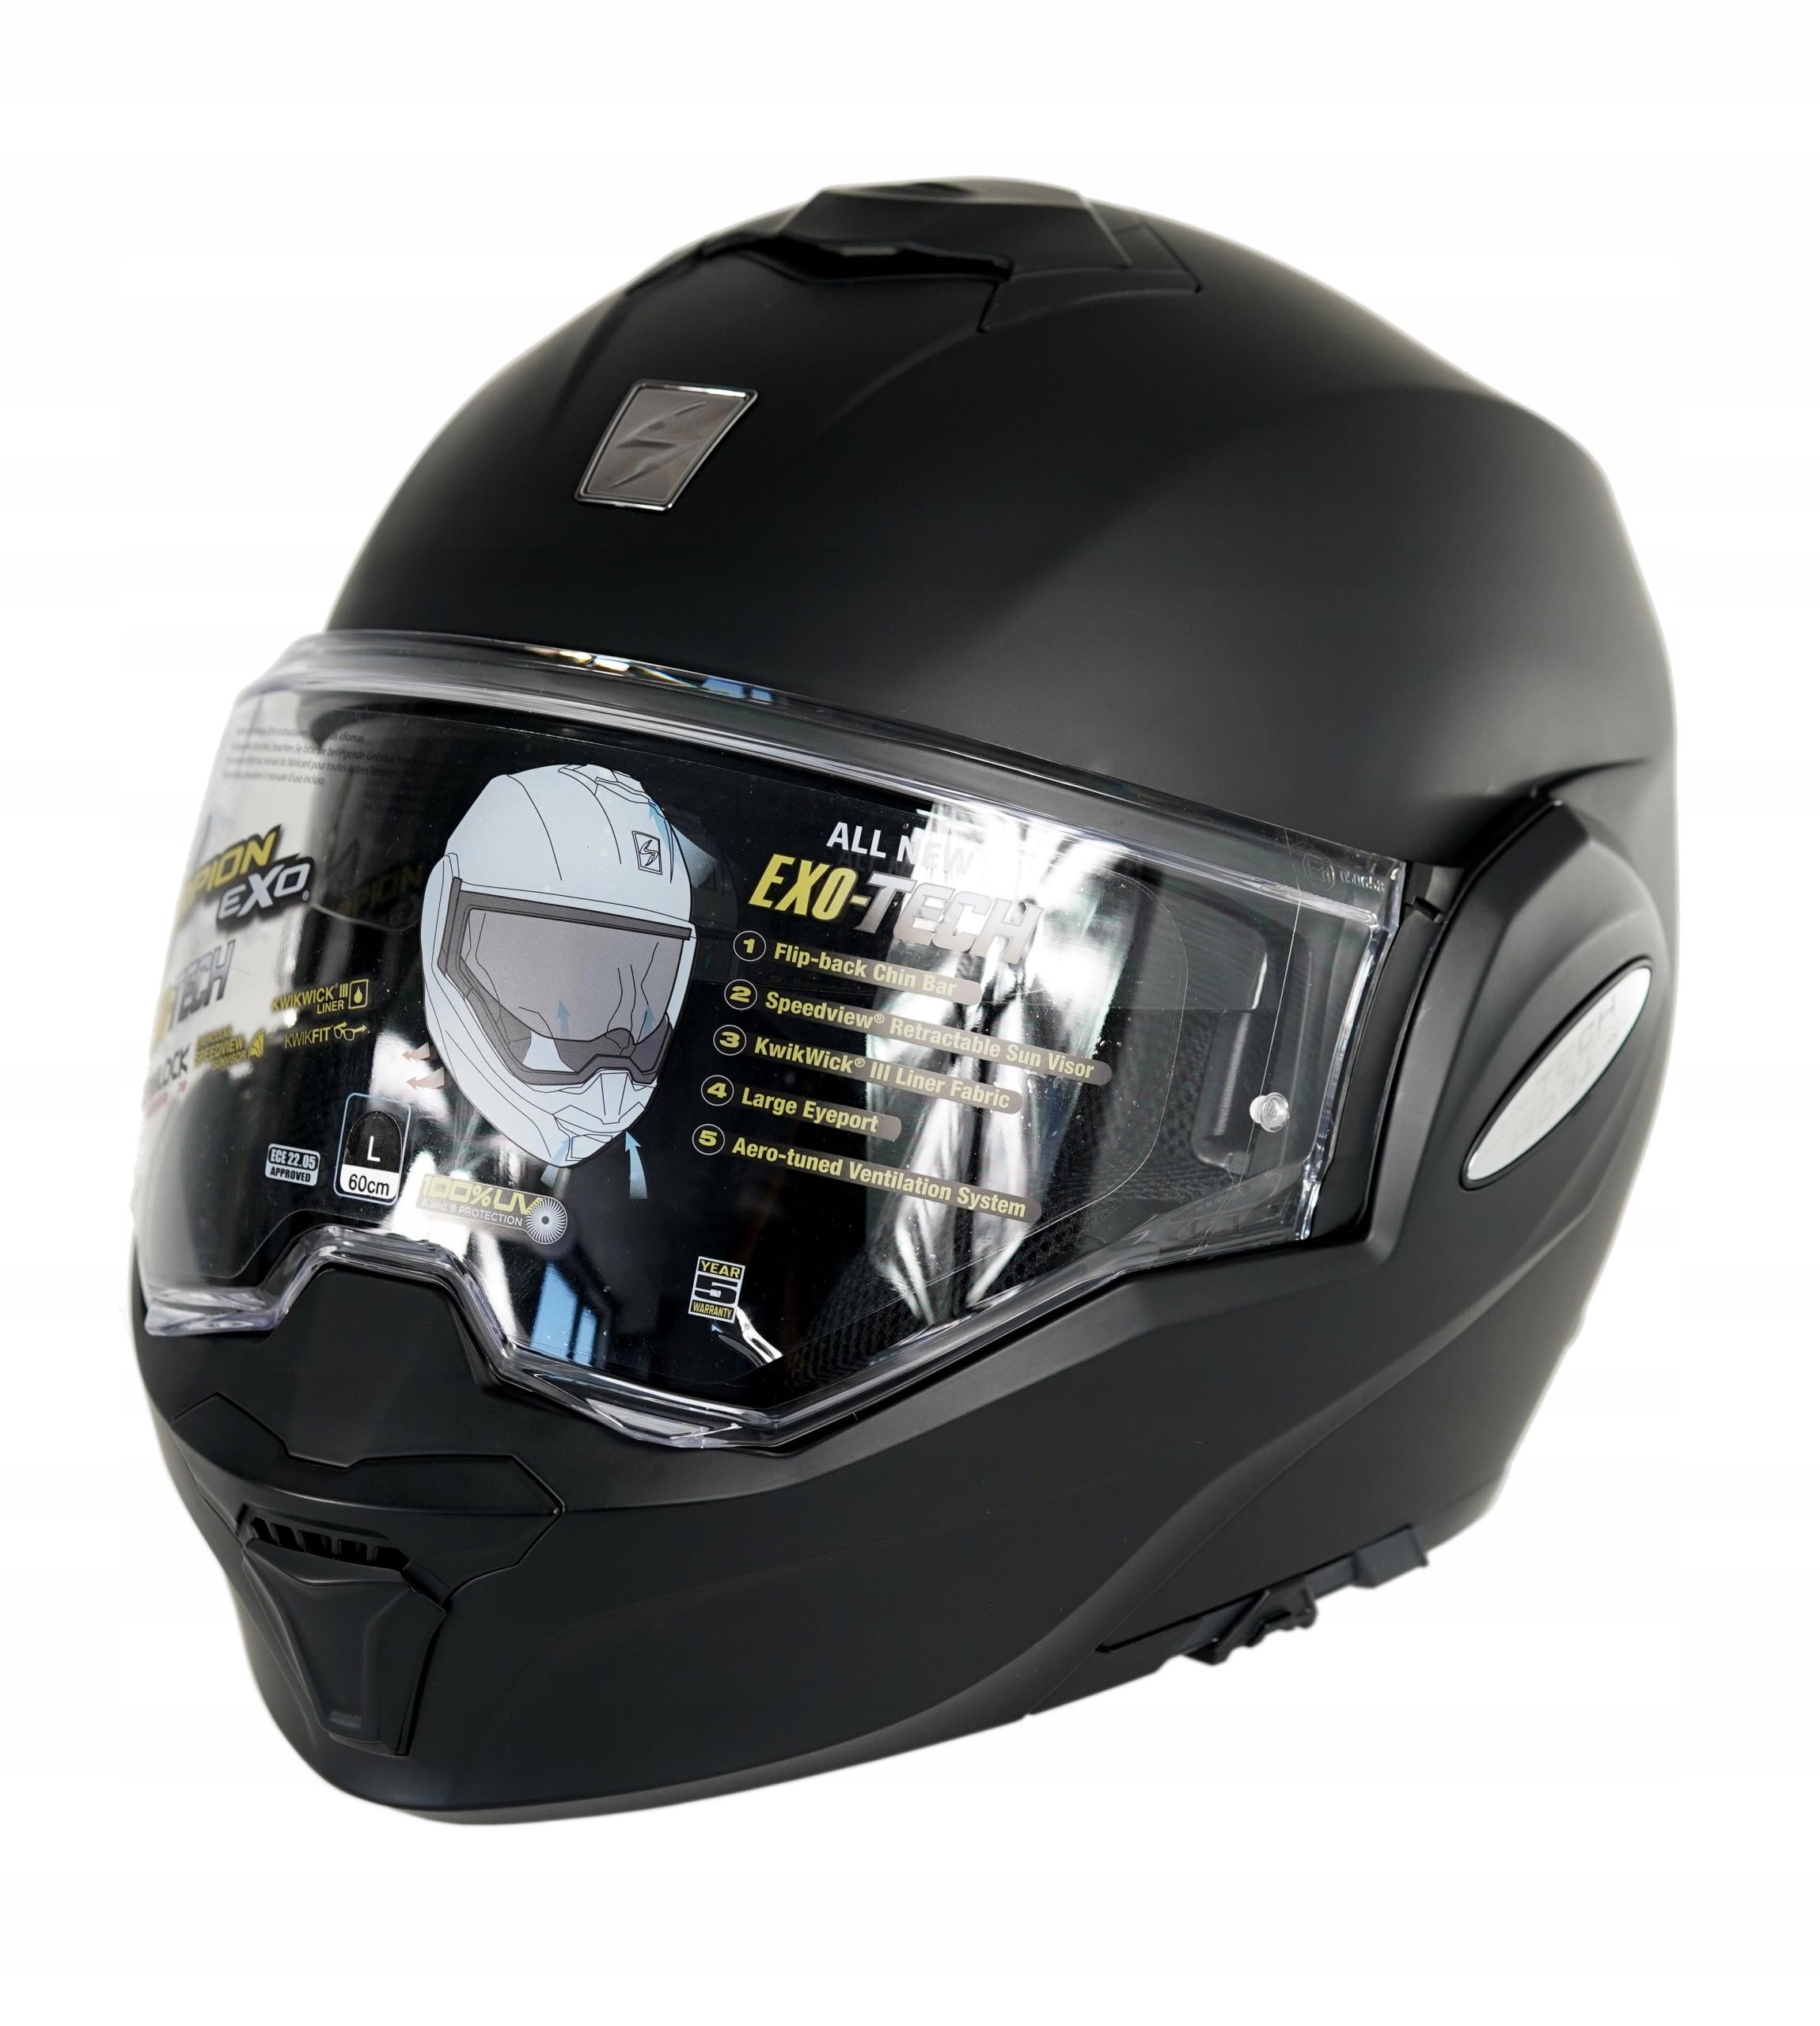 Шлем Scorpion Exo Tech модульная ECE pinlock диафрагмы